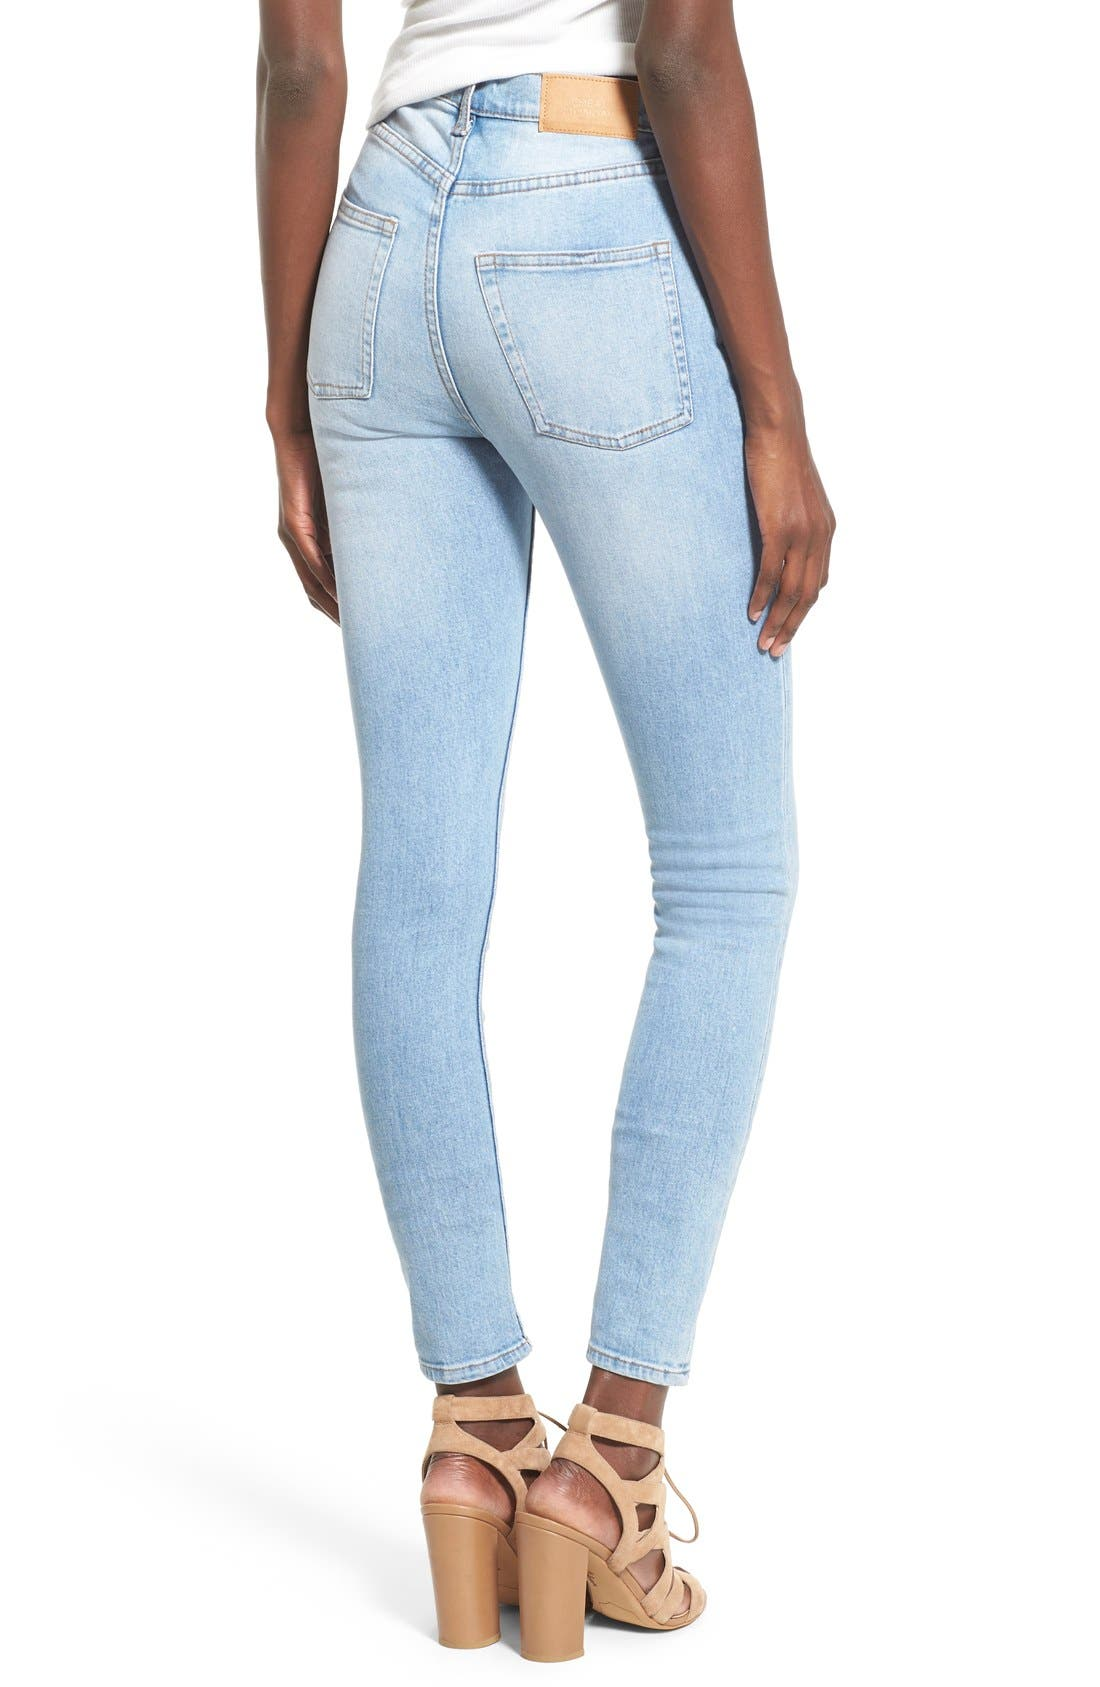 Alternate Image 2  - Cheap Monday 'Second Skin' Skinny Jeans (Stonewash Blue)